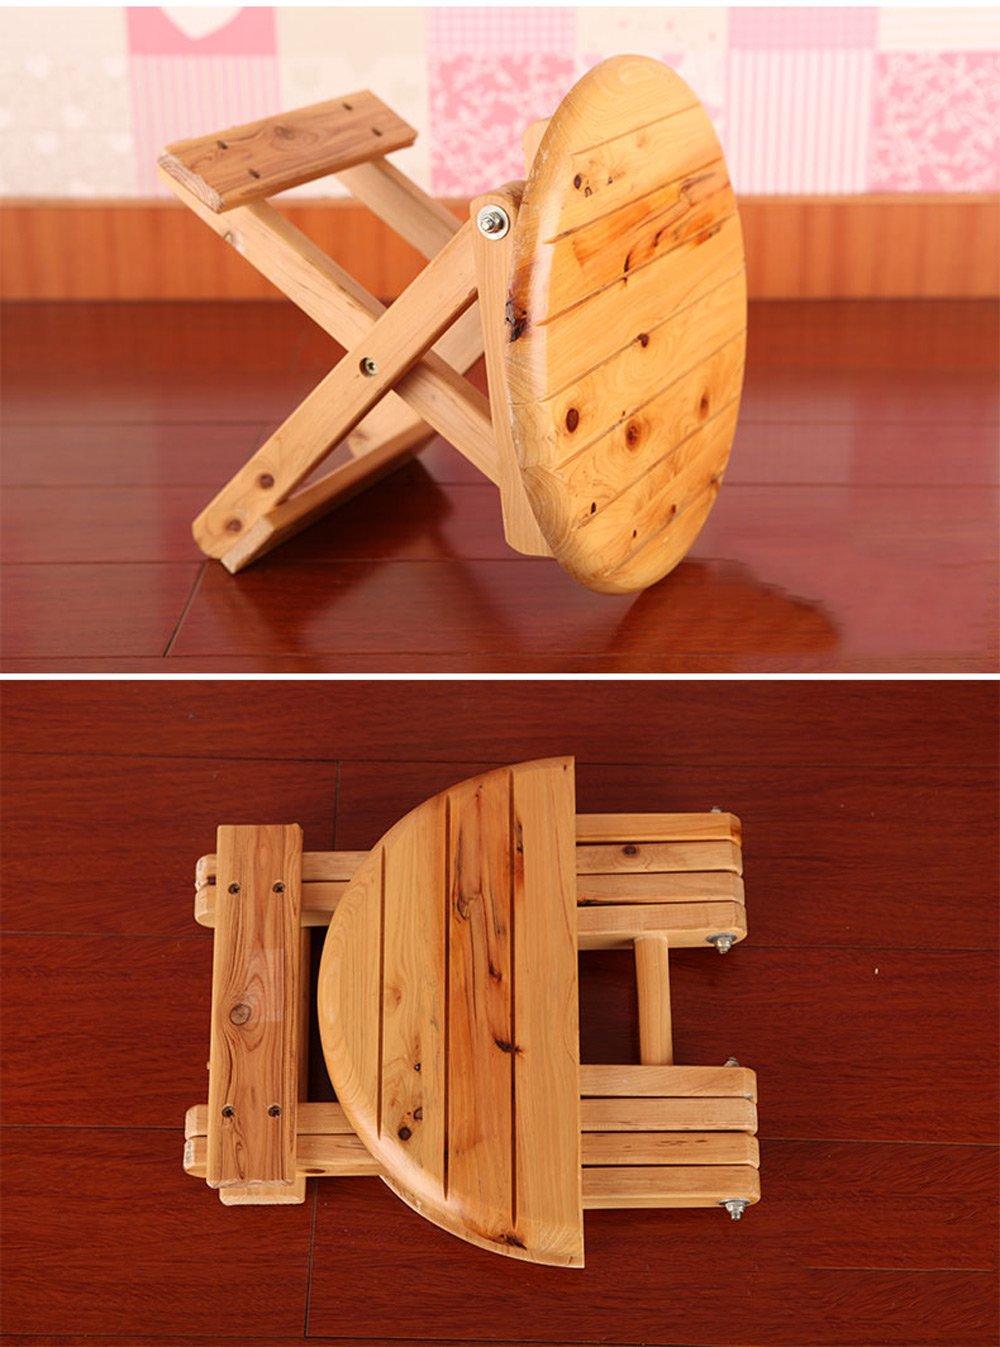 Folding Stool, Folding Small Bench, Solid Wood Stool, Non-plastic Stool, Fishing Stool, Children's Stool by PM-Folding Stools (Image #4)